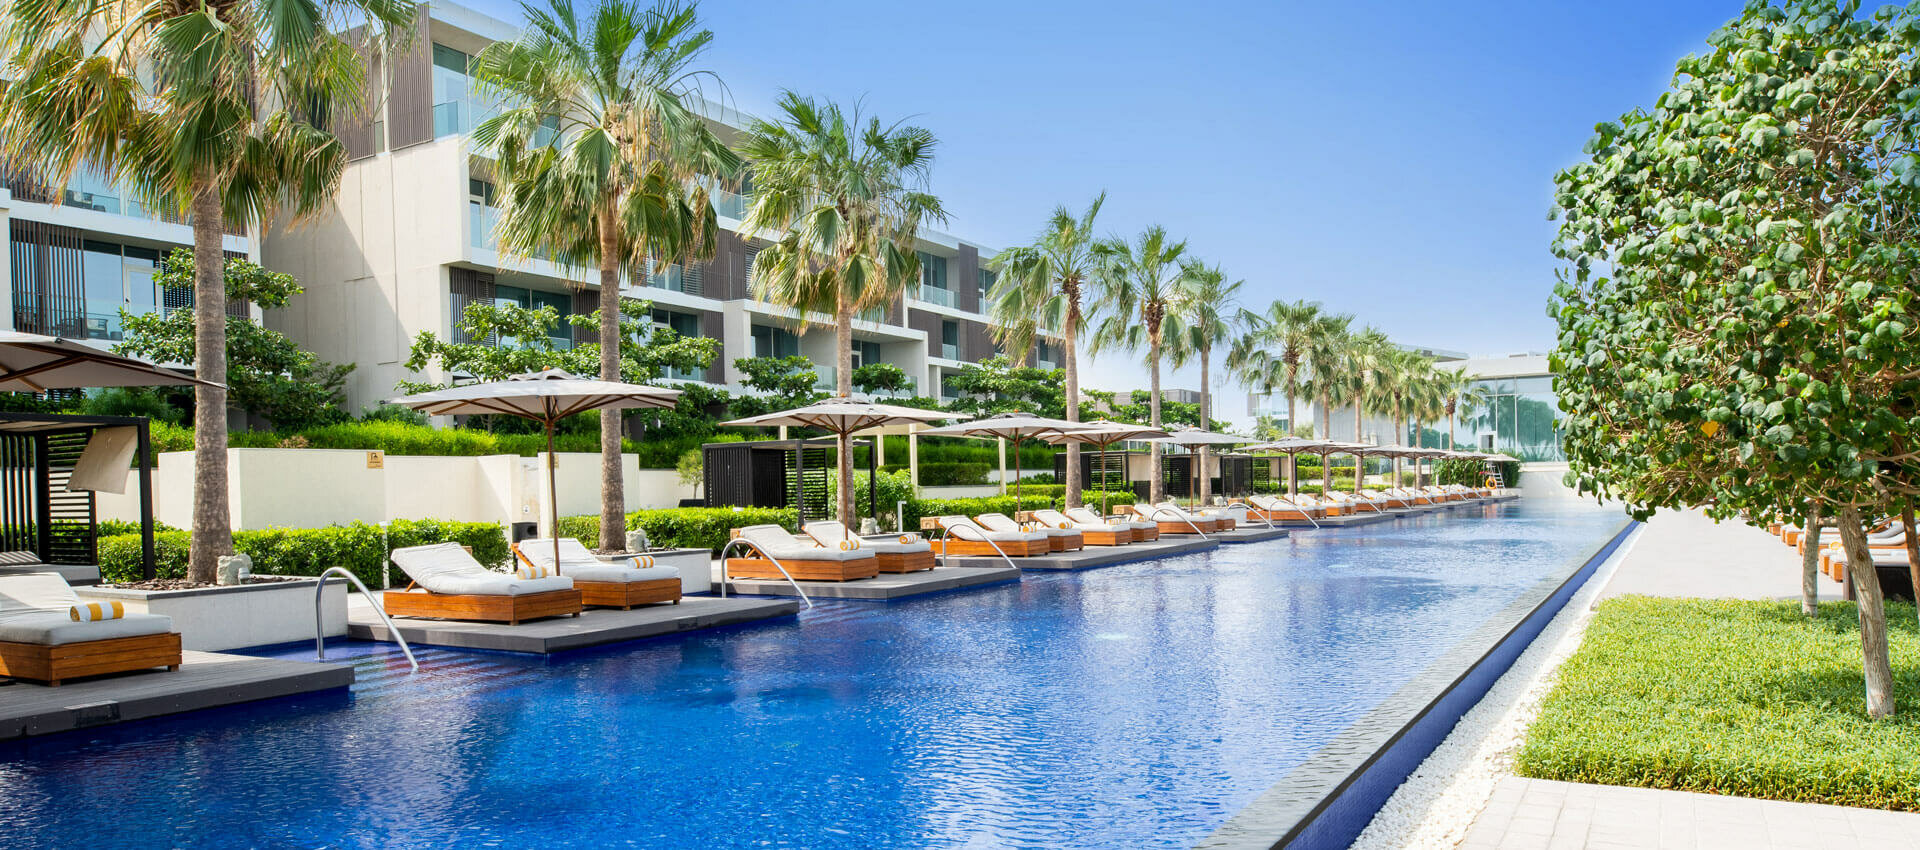 Oberoi Al Zorah piscine